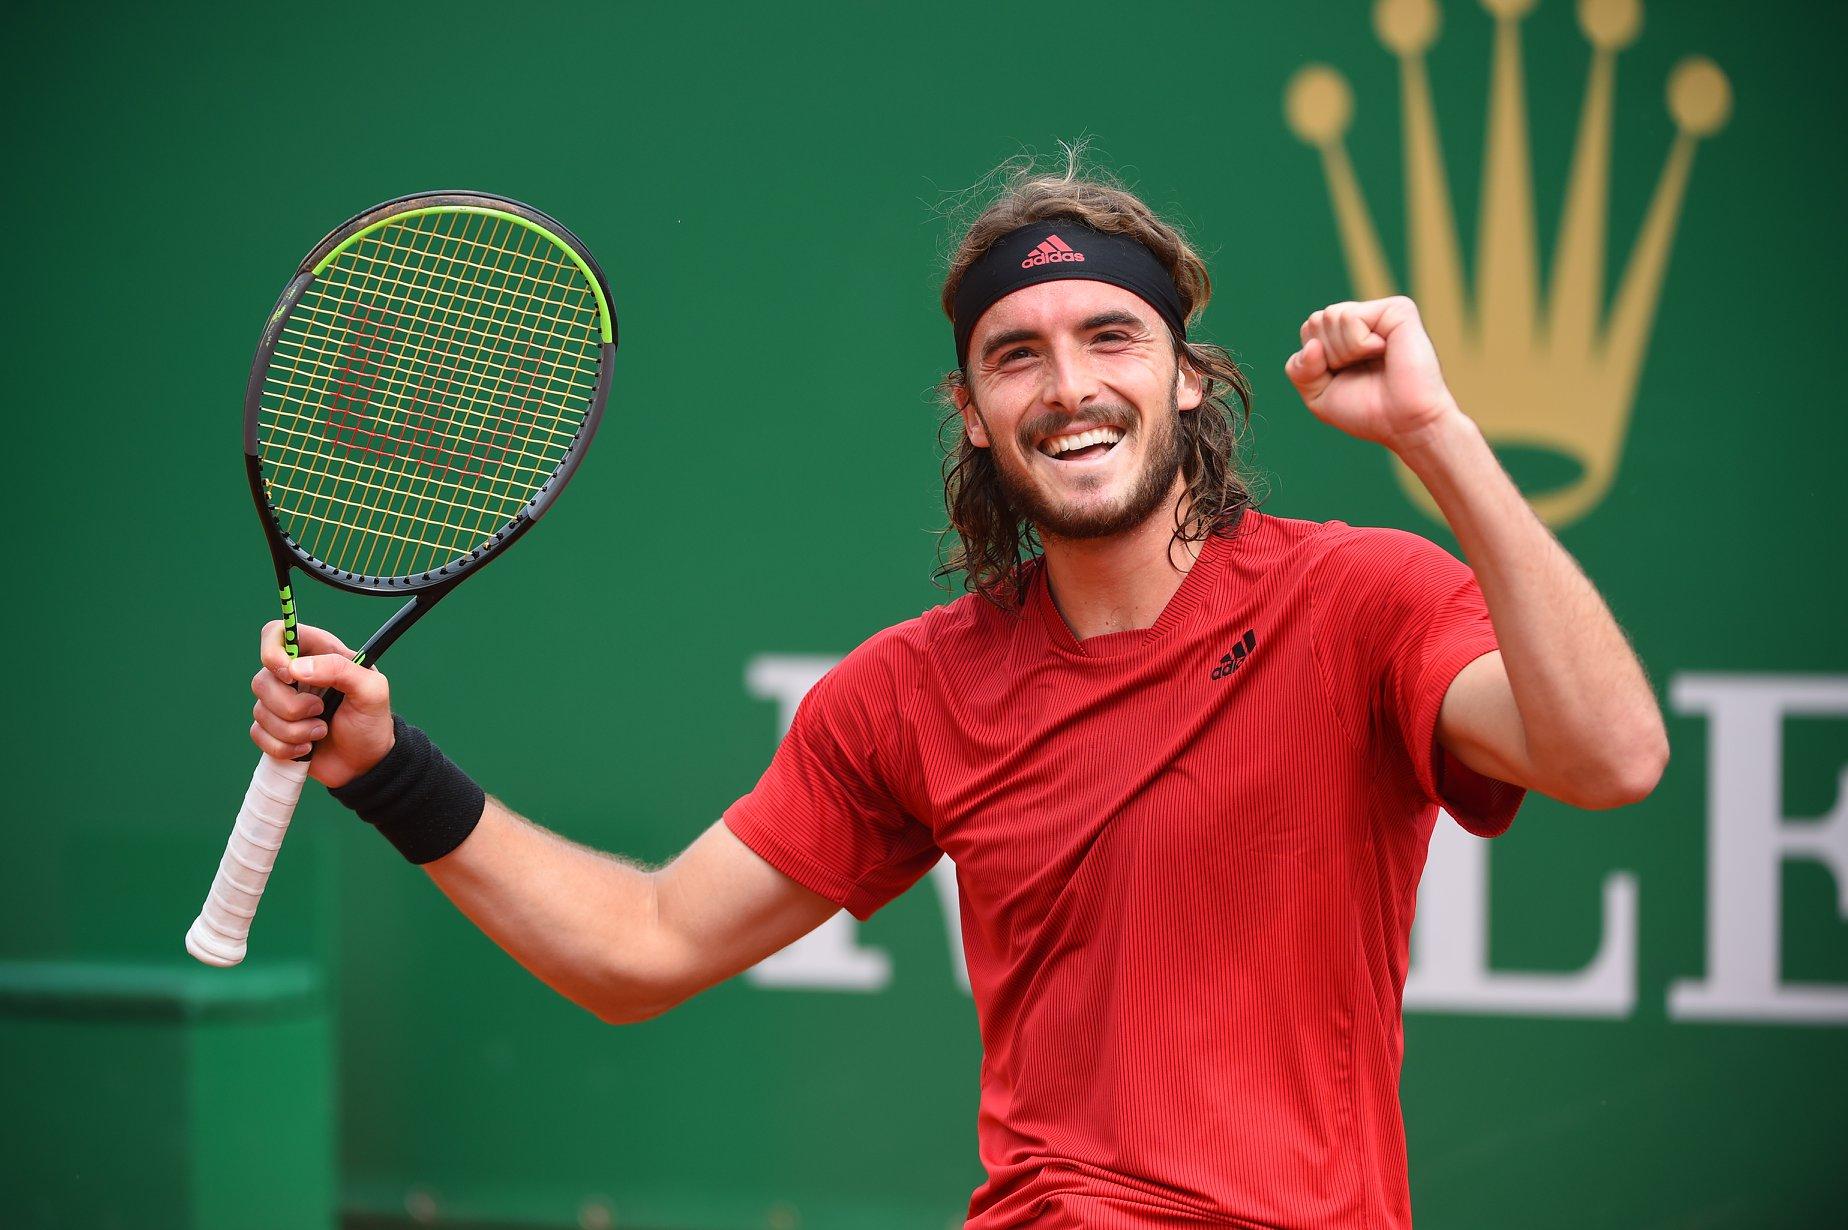 foto roland garros facebook - Đoković začel 333. teden na vrhu ATP, Bedene 58., Tsitsipas do velika uspeha